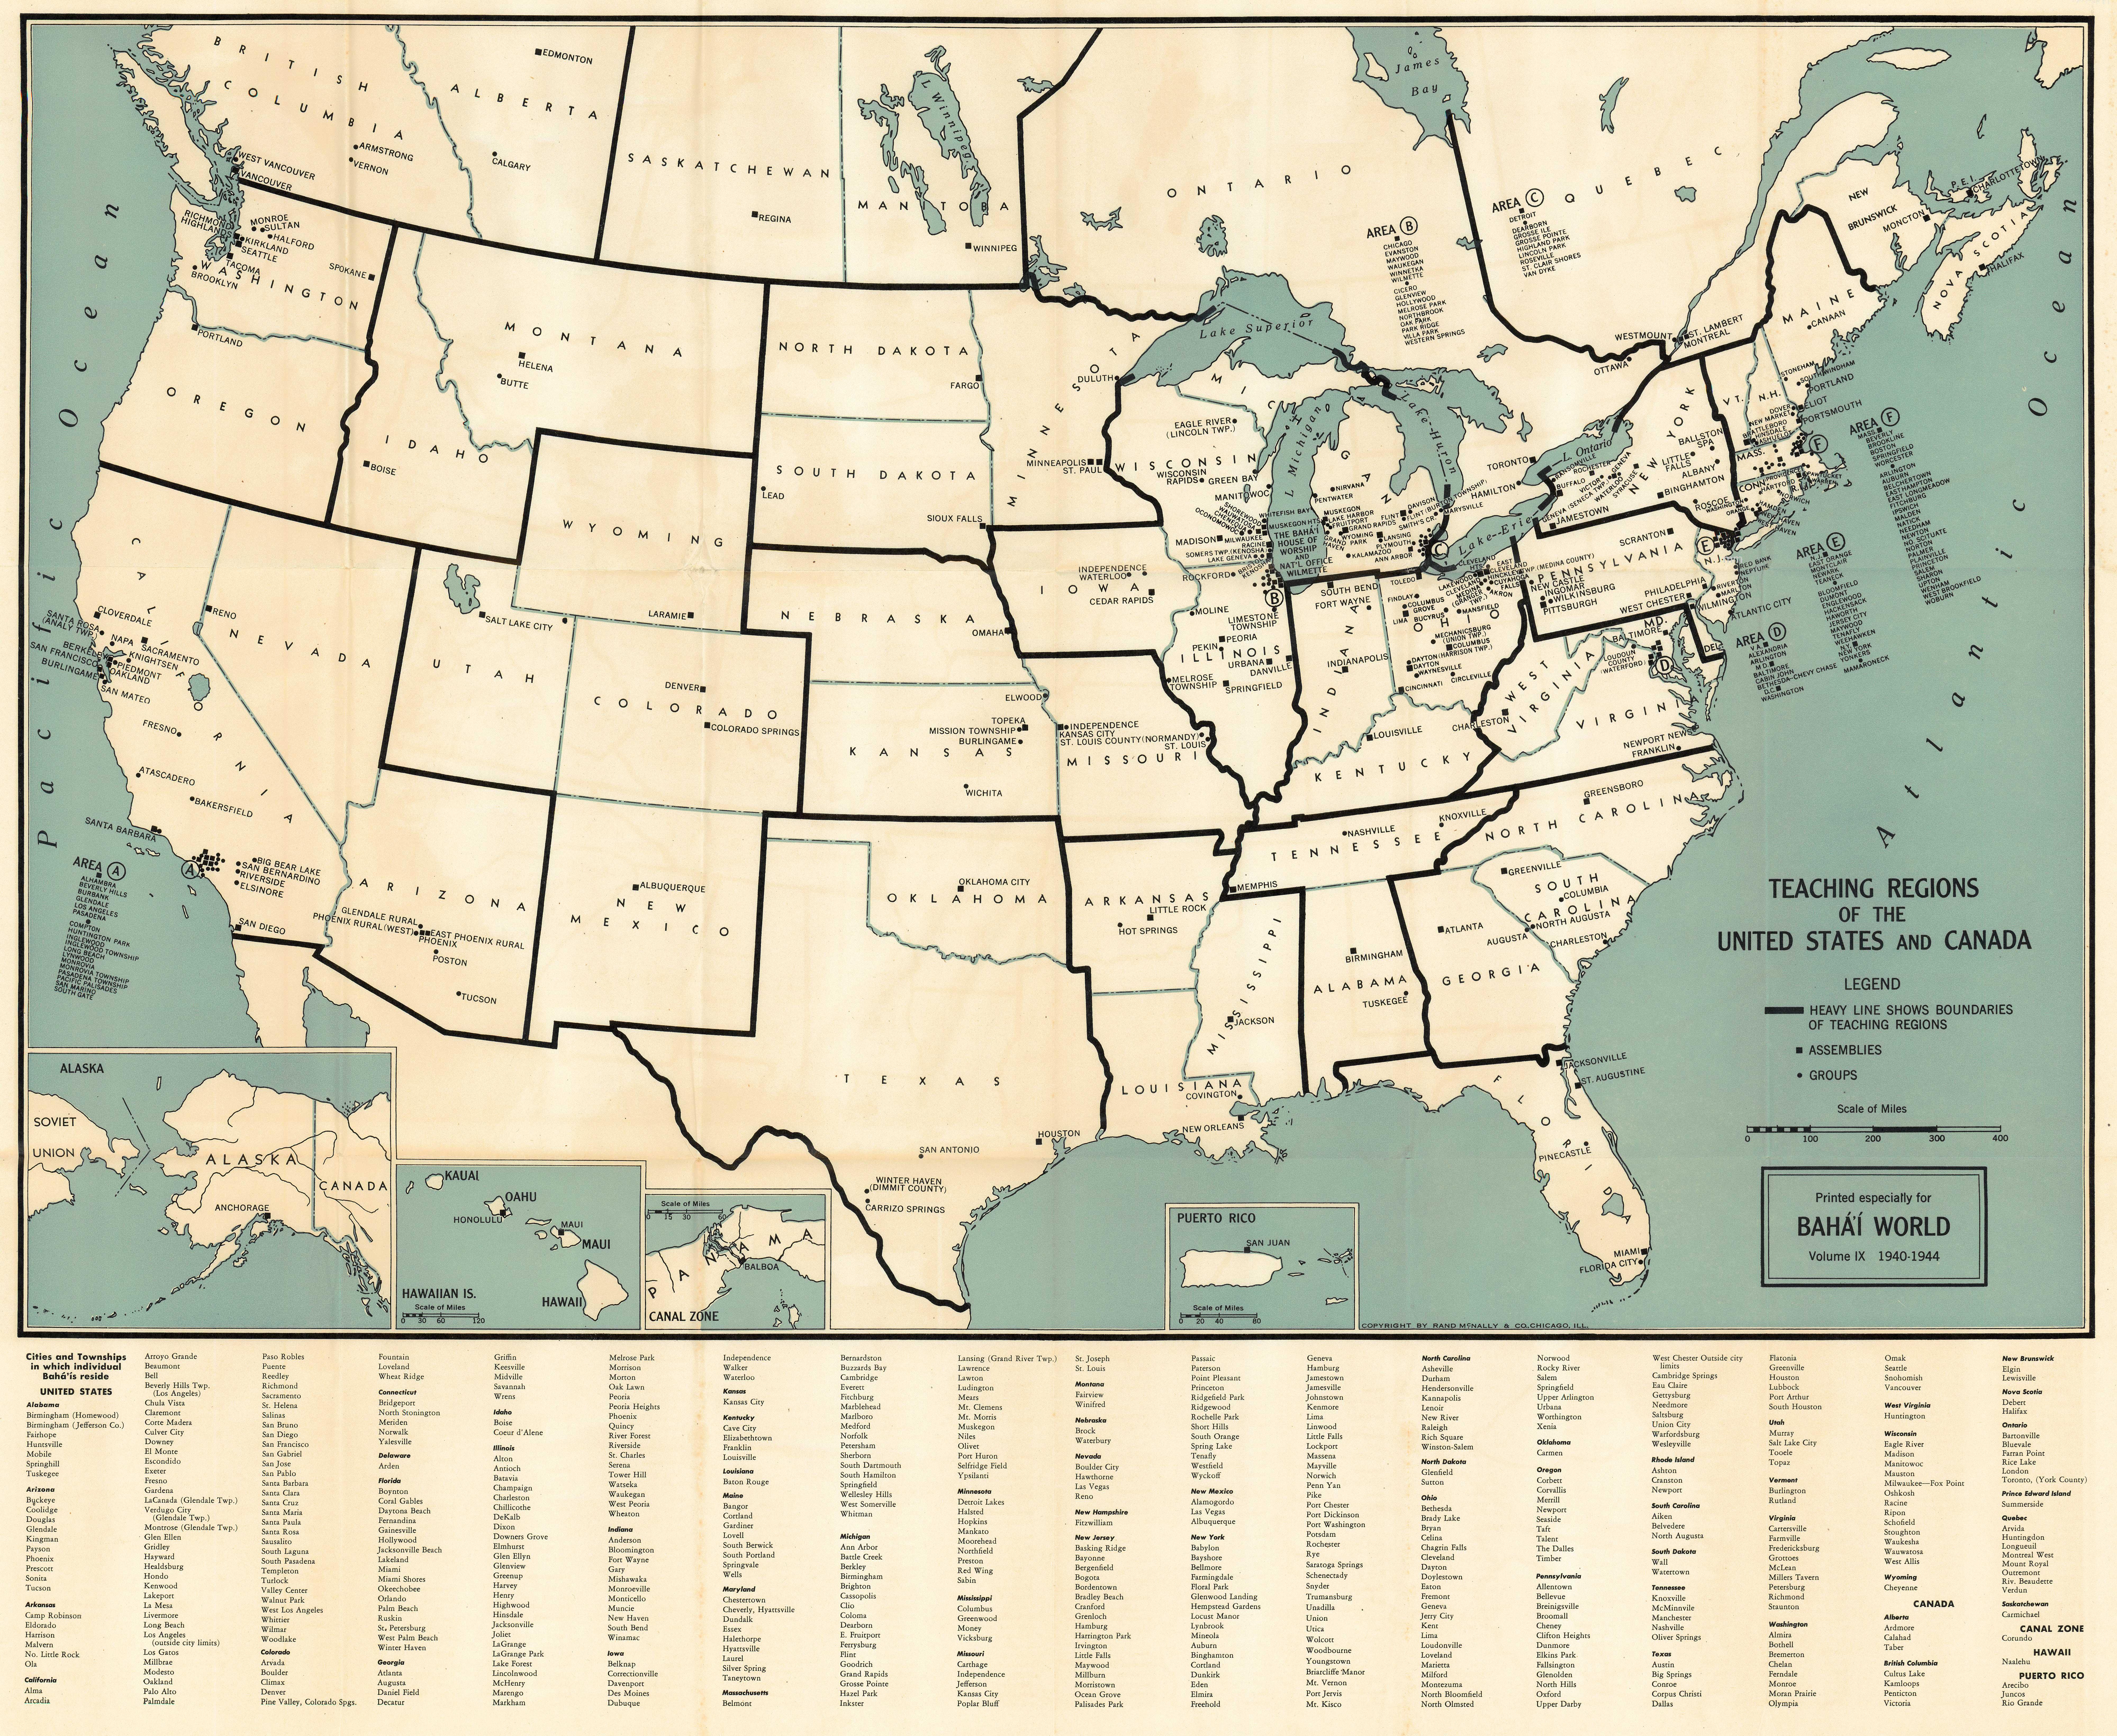 Big 8000x6562 Px 5 5mb Bw09 Map1 Teaching Regions America 1940 Big Jpg